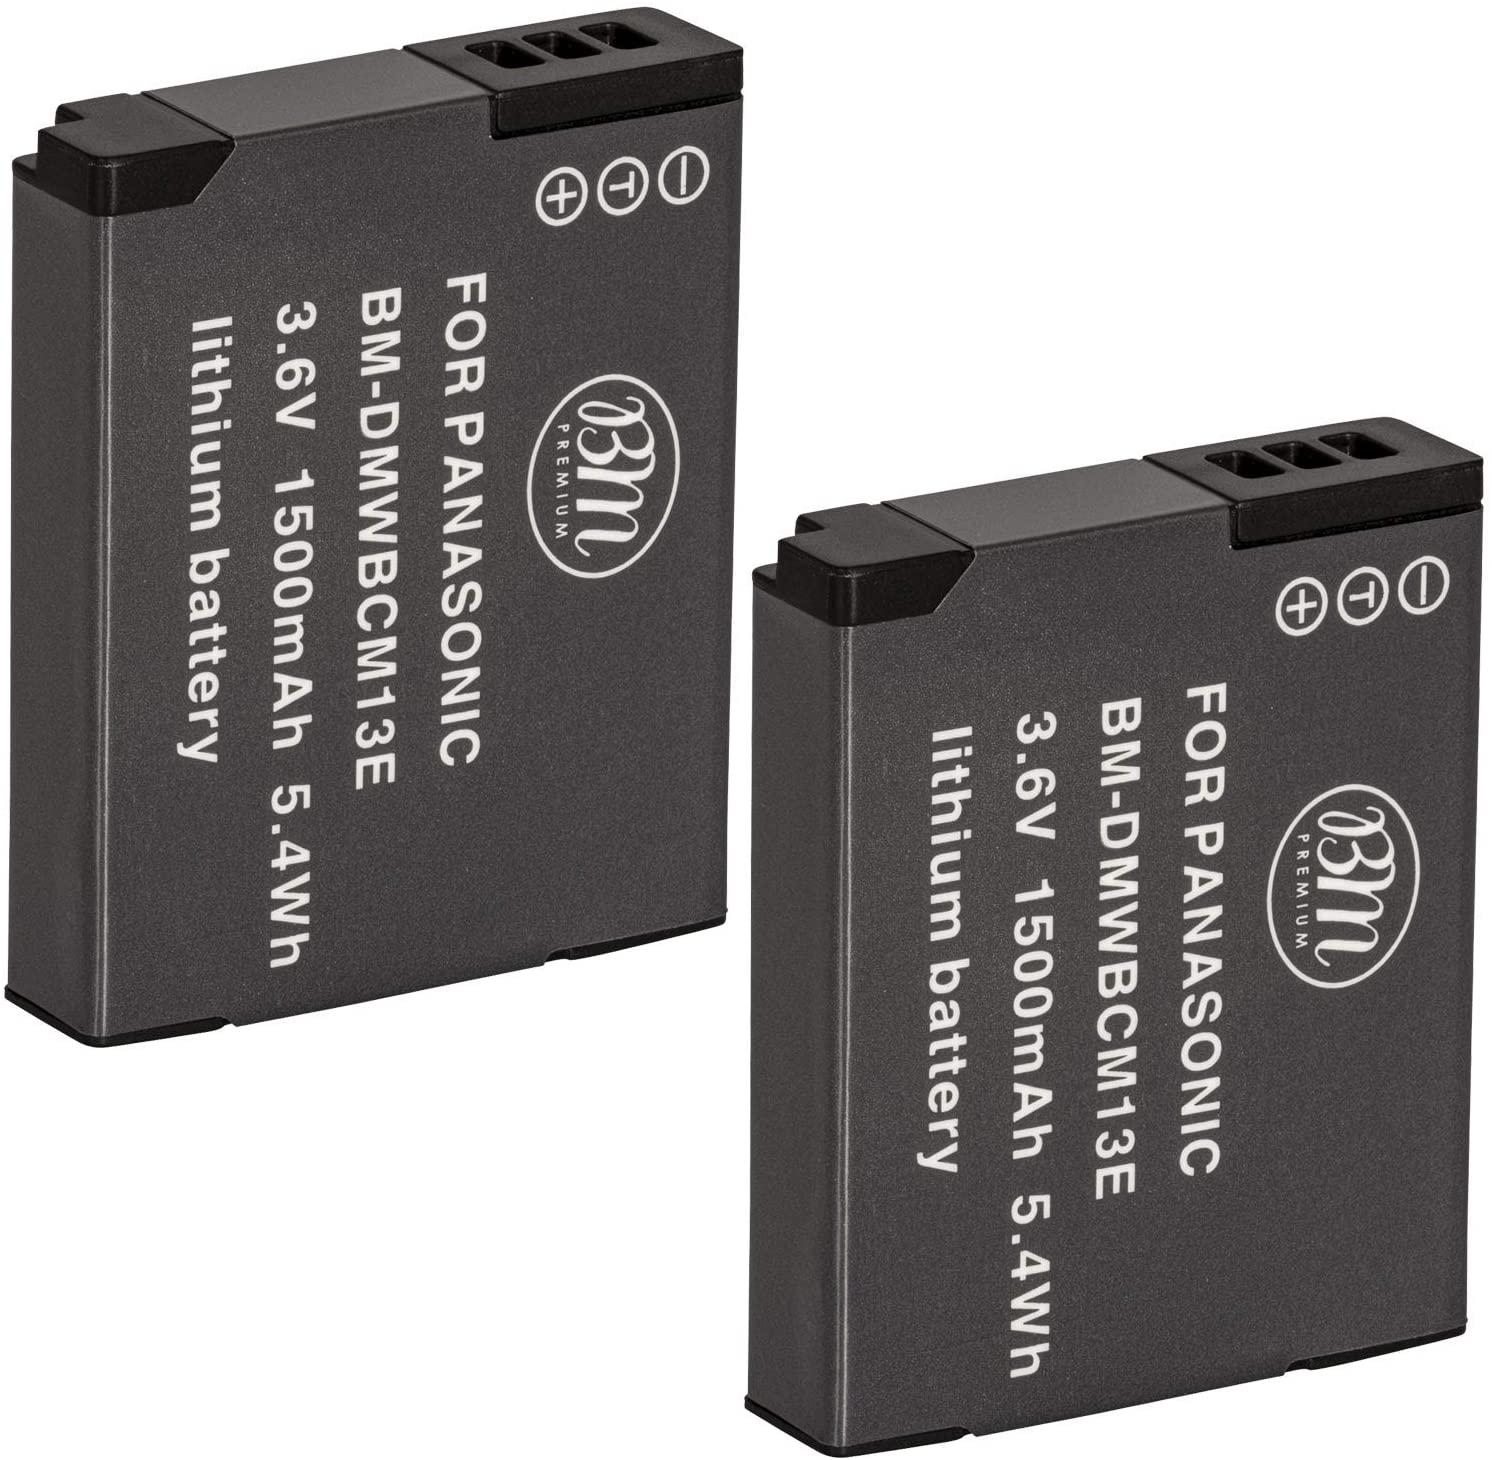 BM Premium 2 Pack of DMW-BCM13E Batteries for Panasonic Lumix DC-TS7, DMC-FT5A, LZ40, TS5, TS6, TZ37, TZ40, TZ41, TZ55, TZ60, DMC-ZS27, DMC-ZS30, DMC-ZS35, DMC-ZS40, DMC-ZS45, DMC-ZS50 Digital Cameras